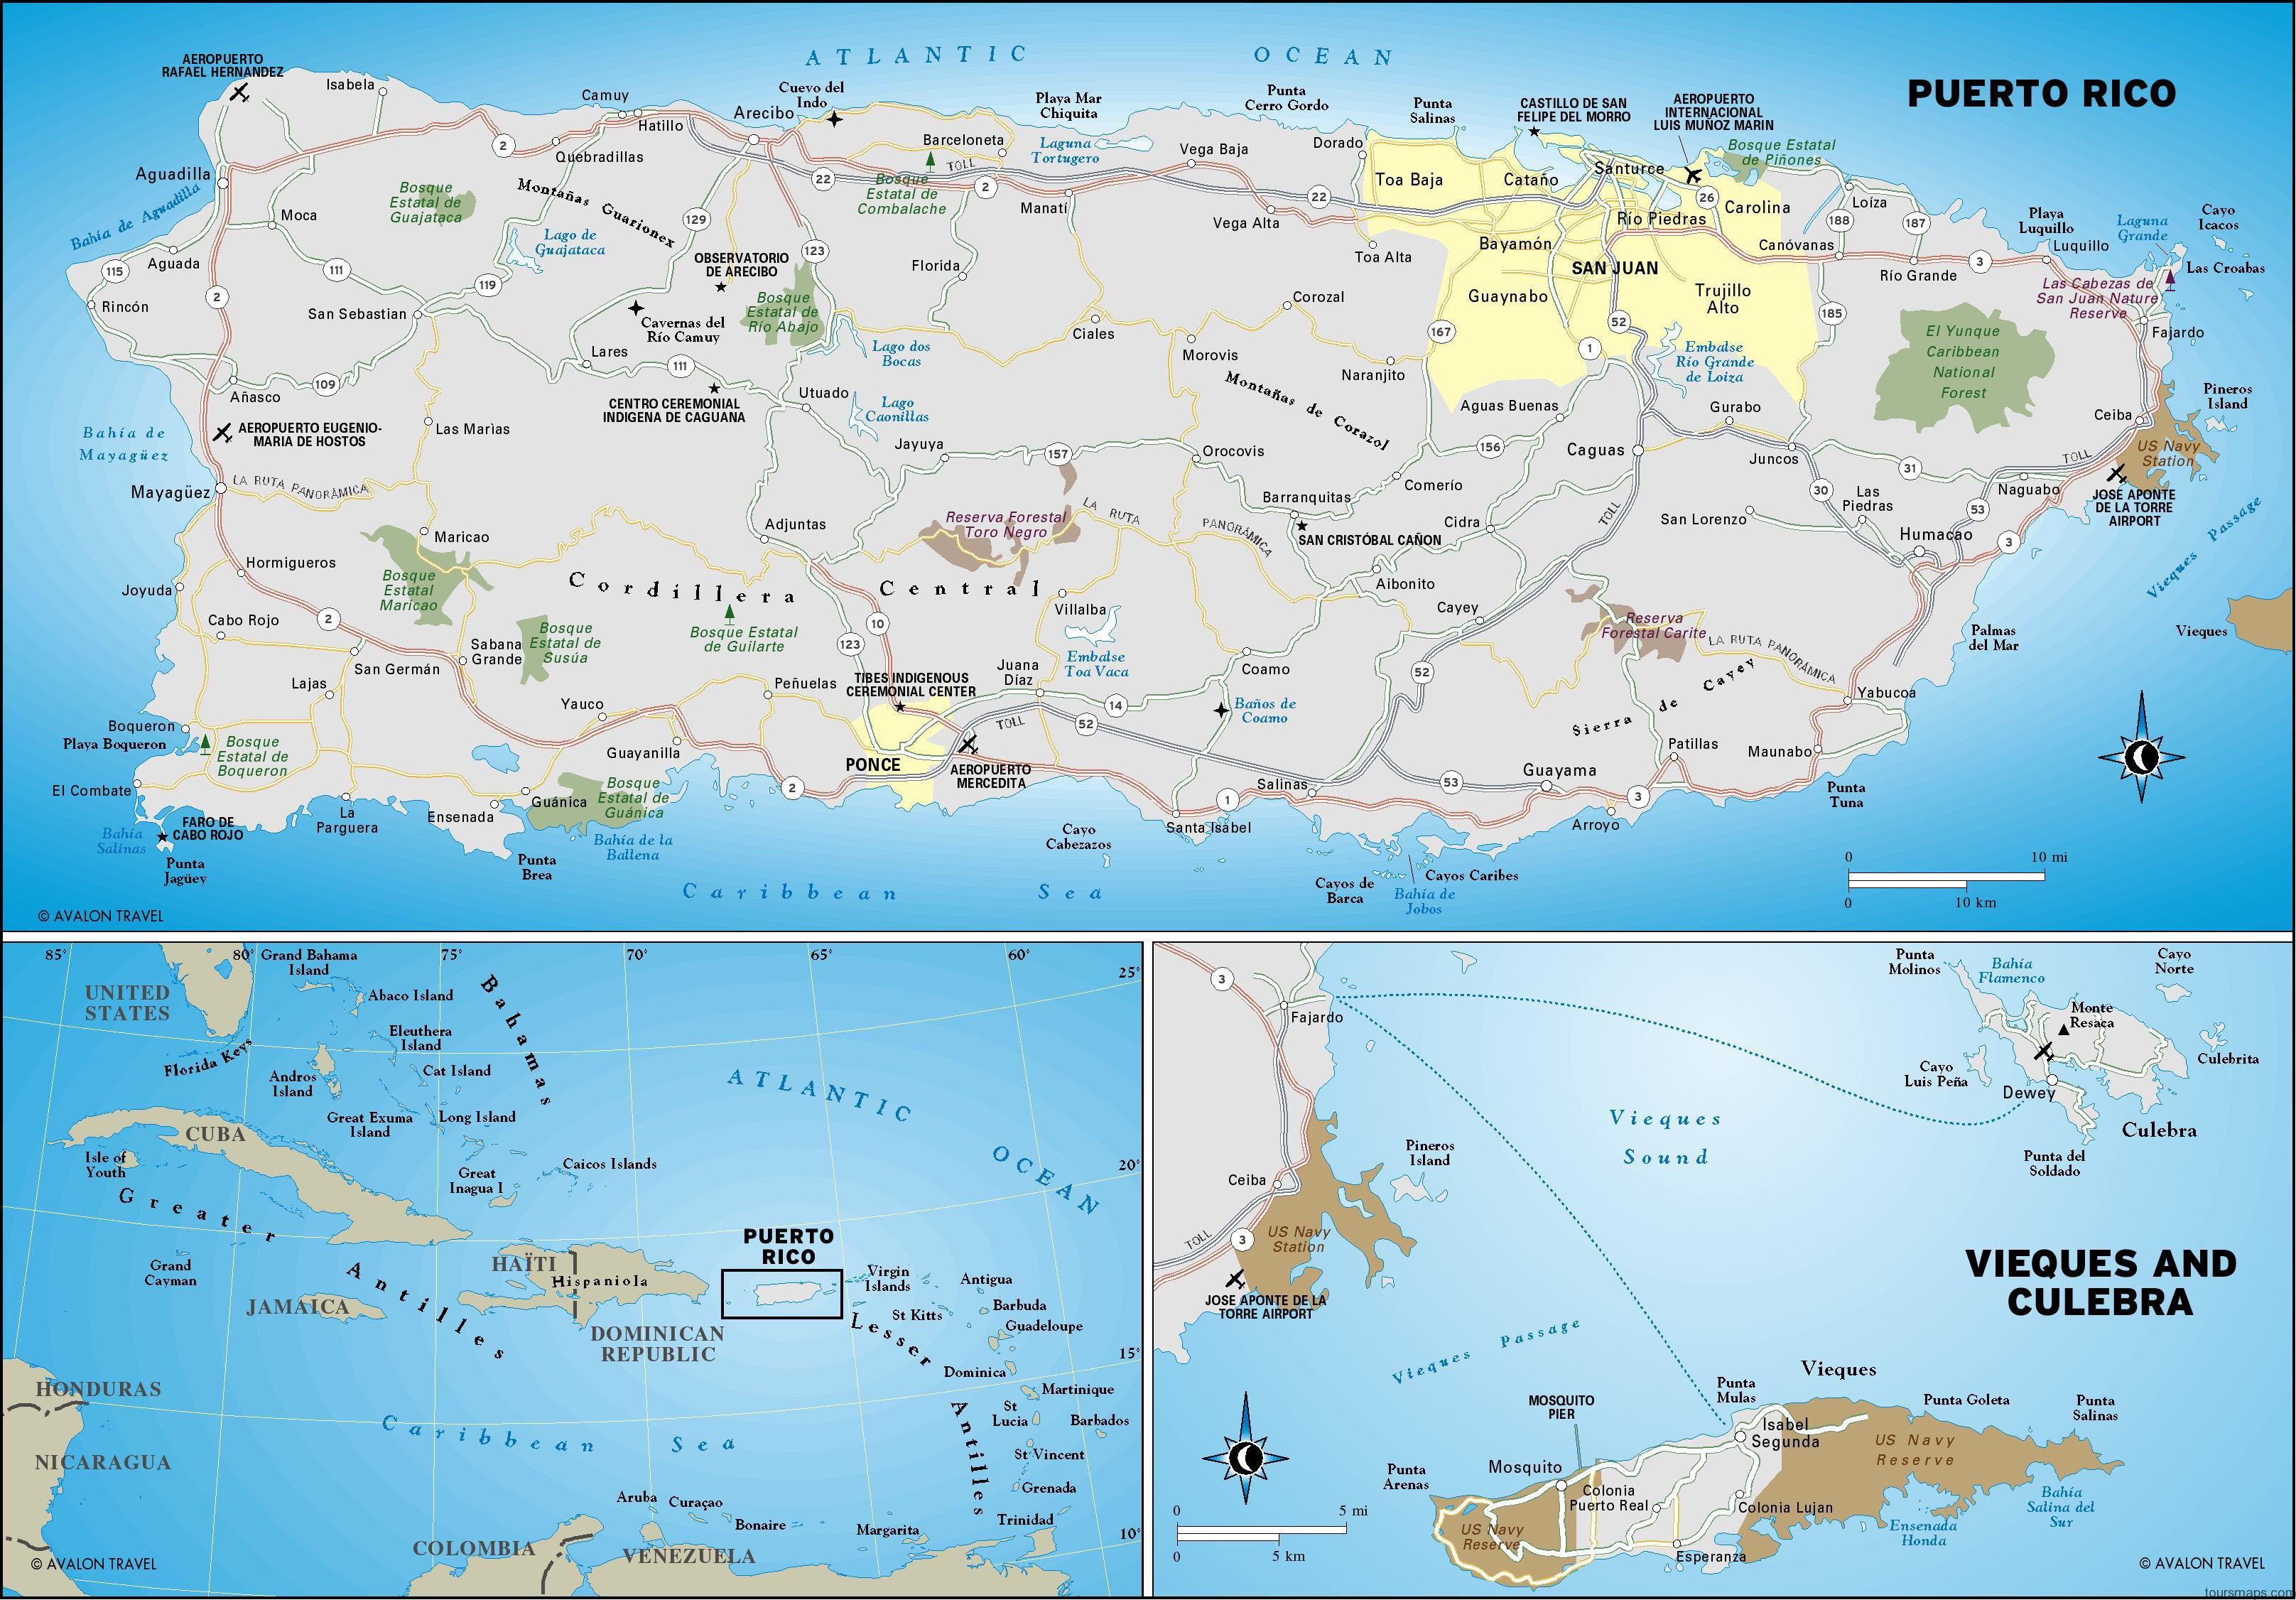 Puerto Rico Map_6.jpg